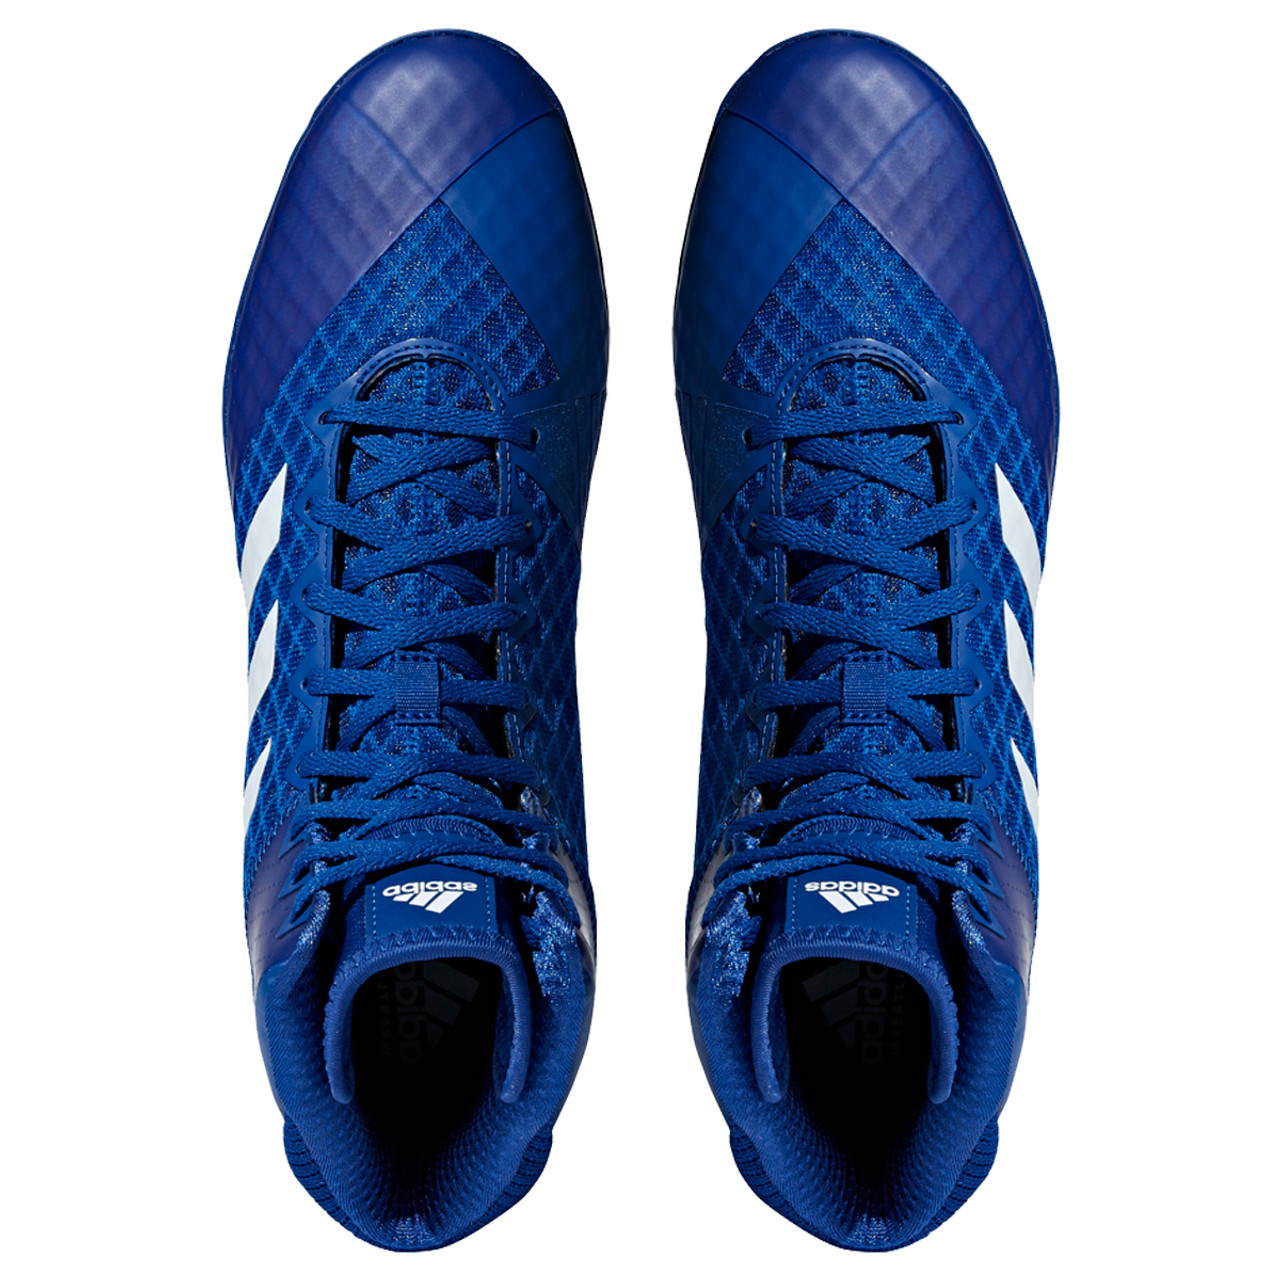 9864b9e4fd07 Adidas Mat Wizard 4 Men s Wrestling Shoes AC6973 - Royal